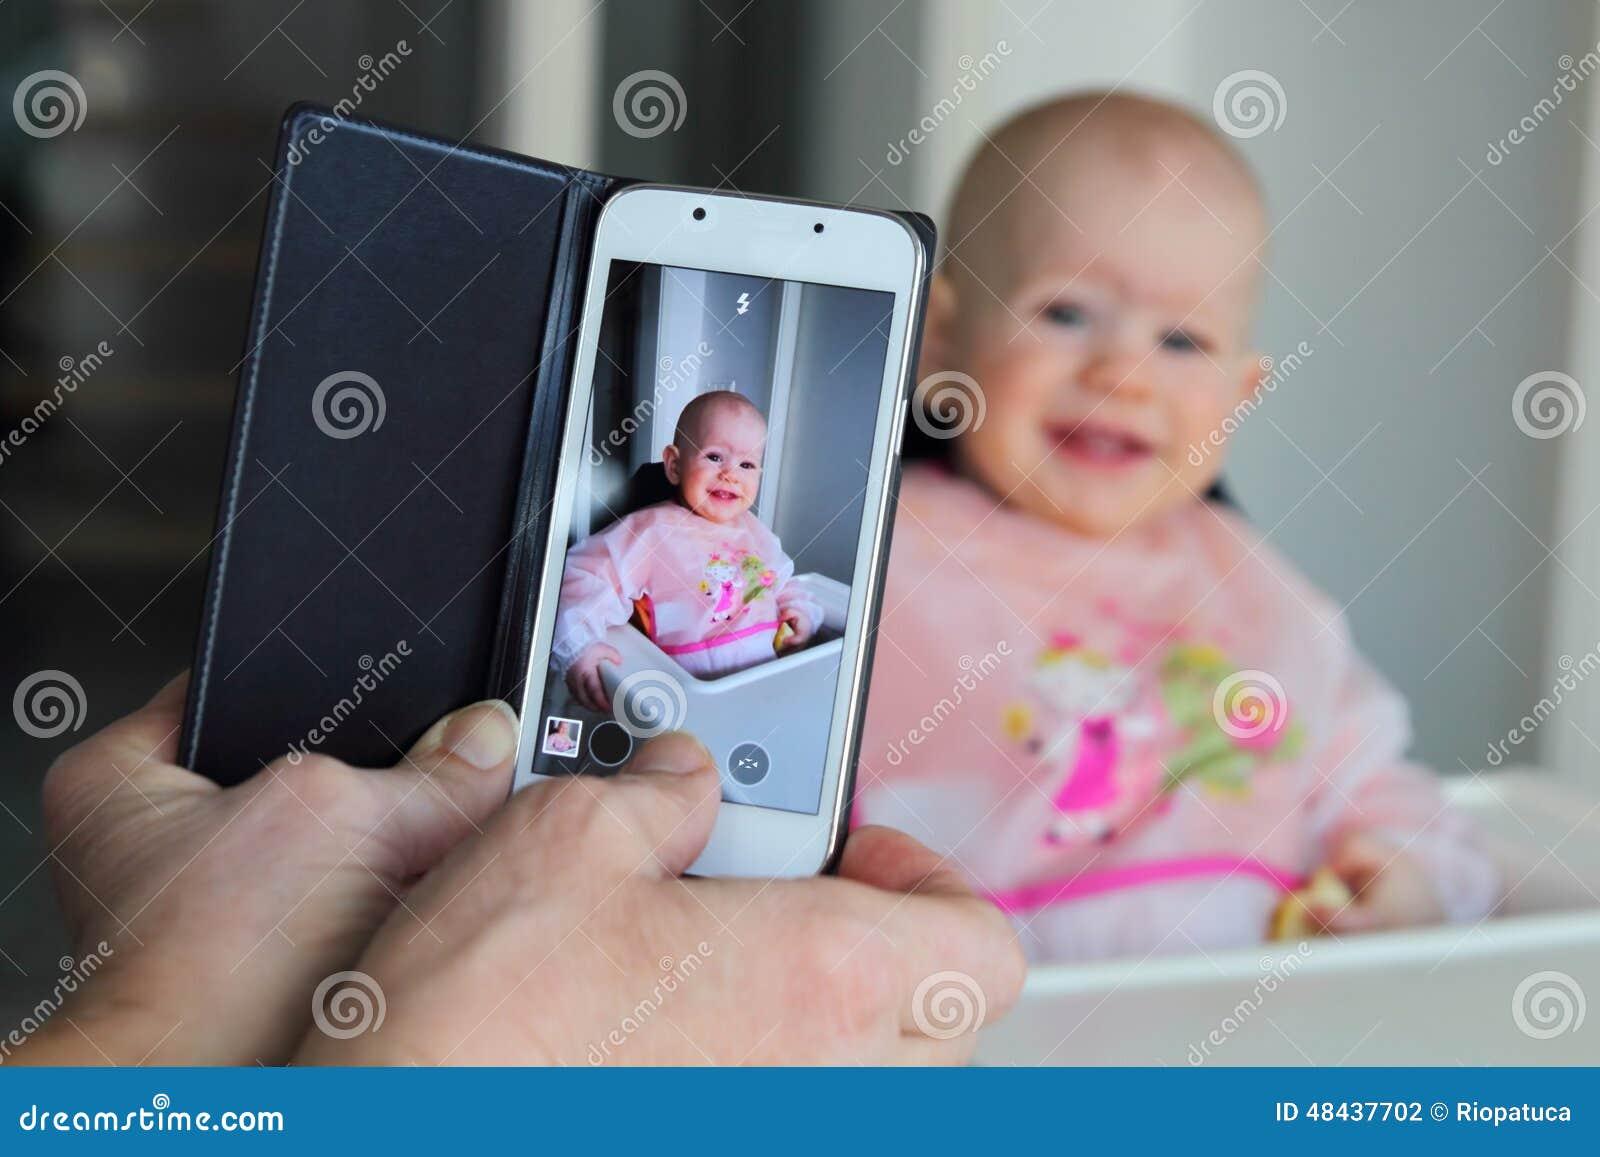 prendre une photo d u0026 39 un b u00e9b u00e9 avec un t u00e9l u00e9phone portable